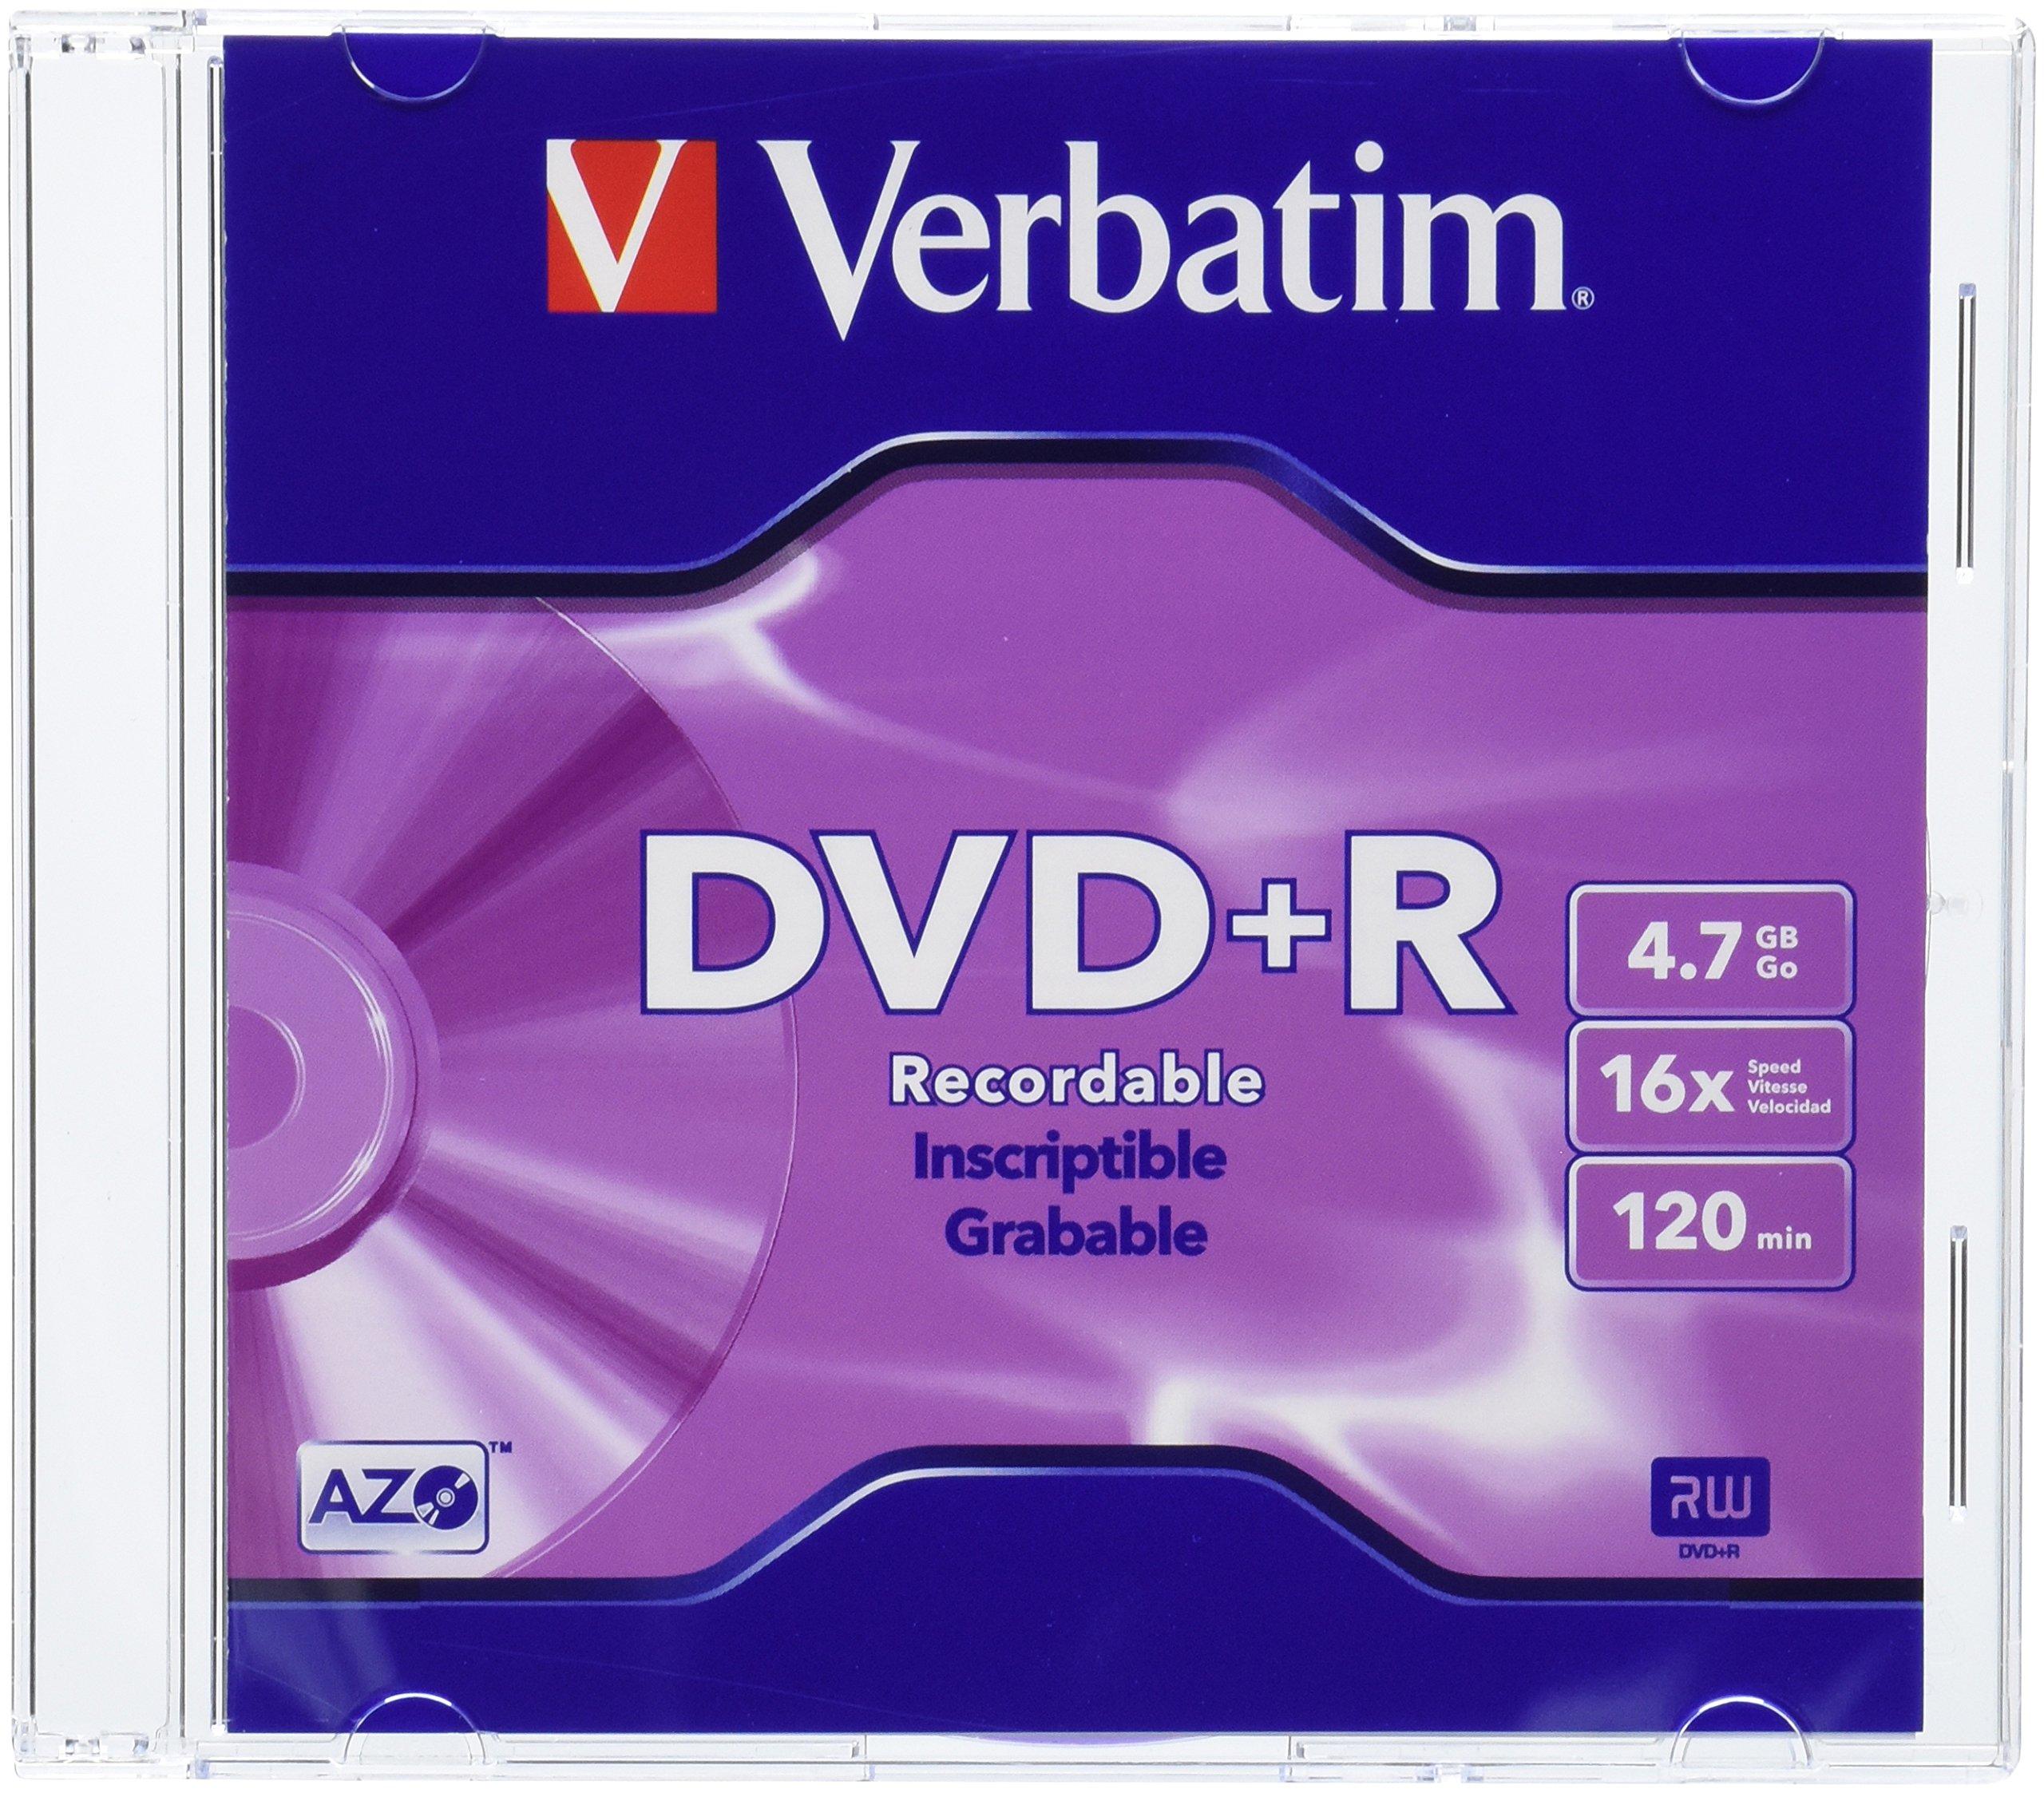 Verbatim 4.7 GB up to 16X Branded Recordable Disc DVD+R 10-Disc Slim Case 95097